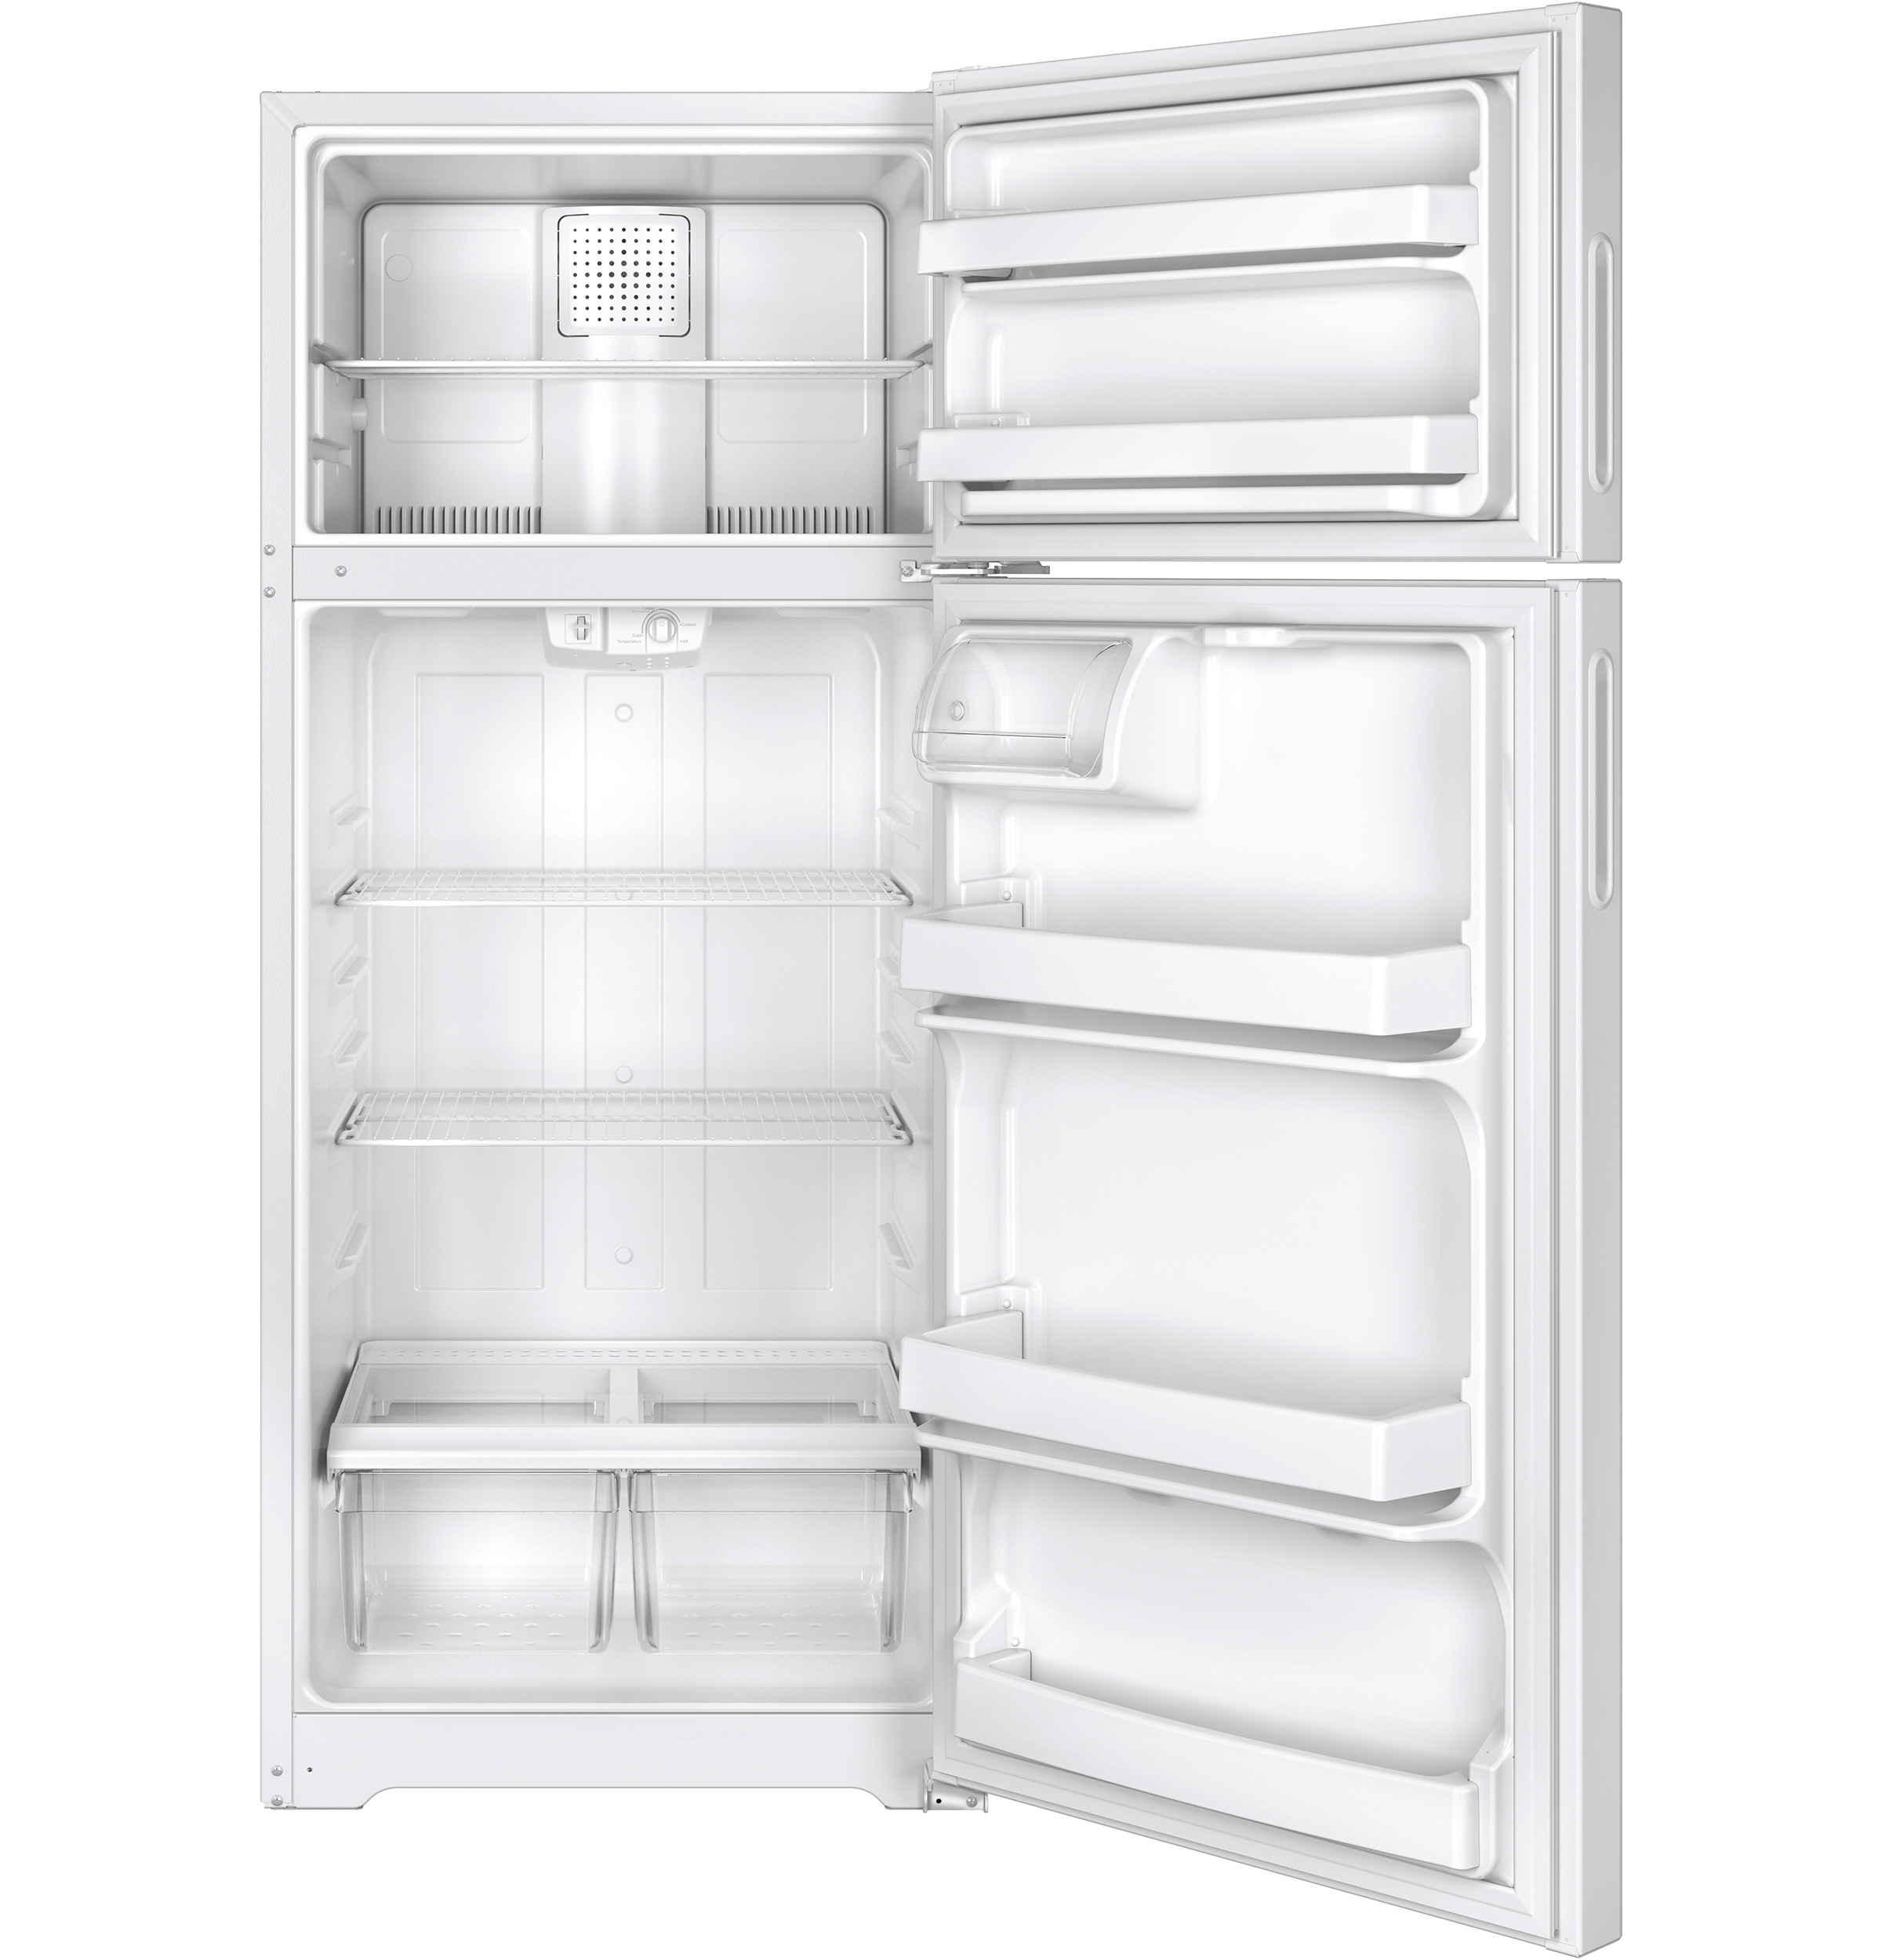 Model: HPS18BTHWW | Hotpoint® 17.5 Cu. Ft. Top-Freezer Refrigerator